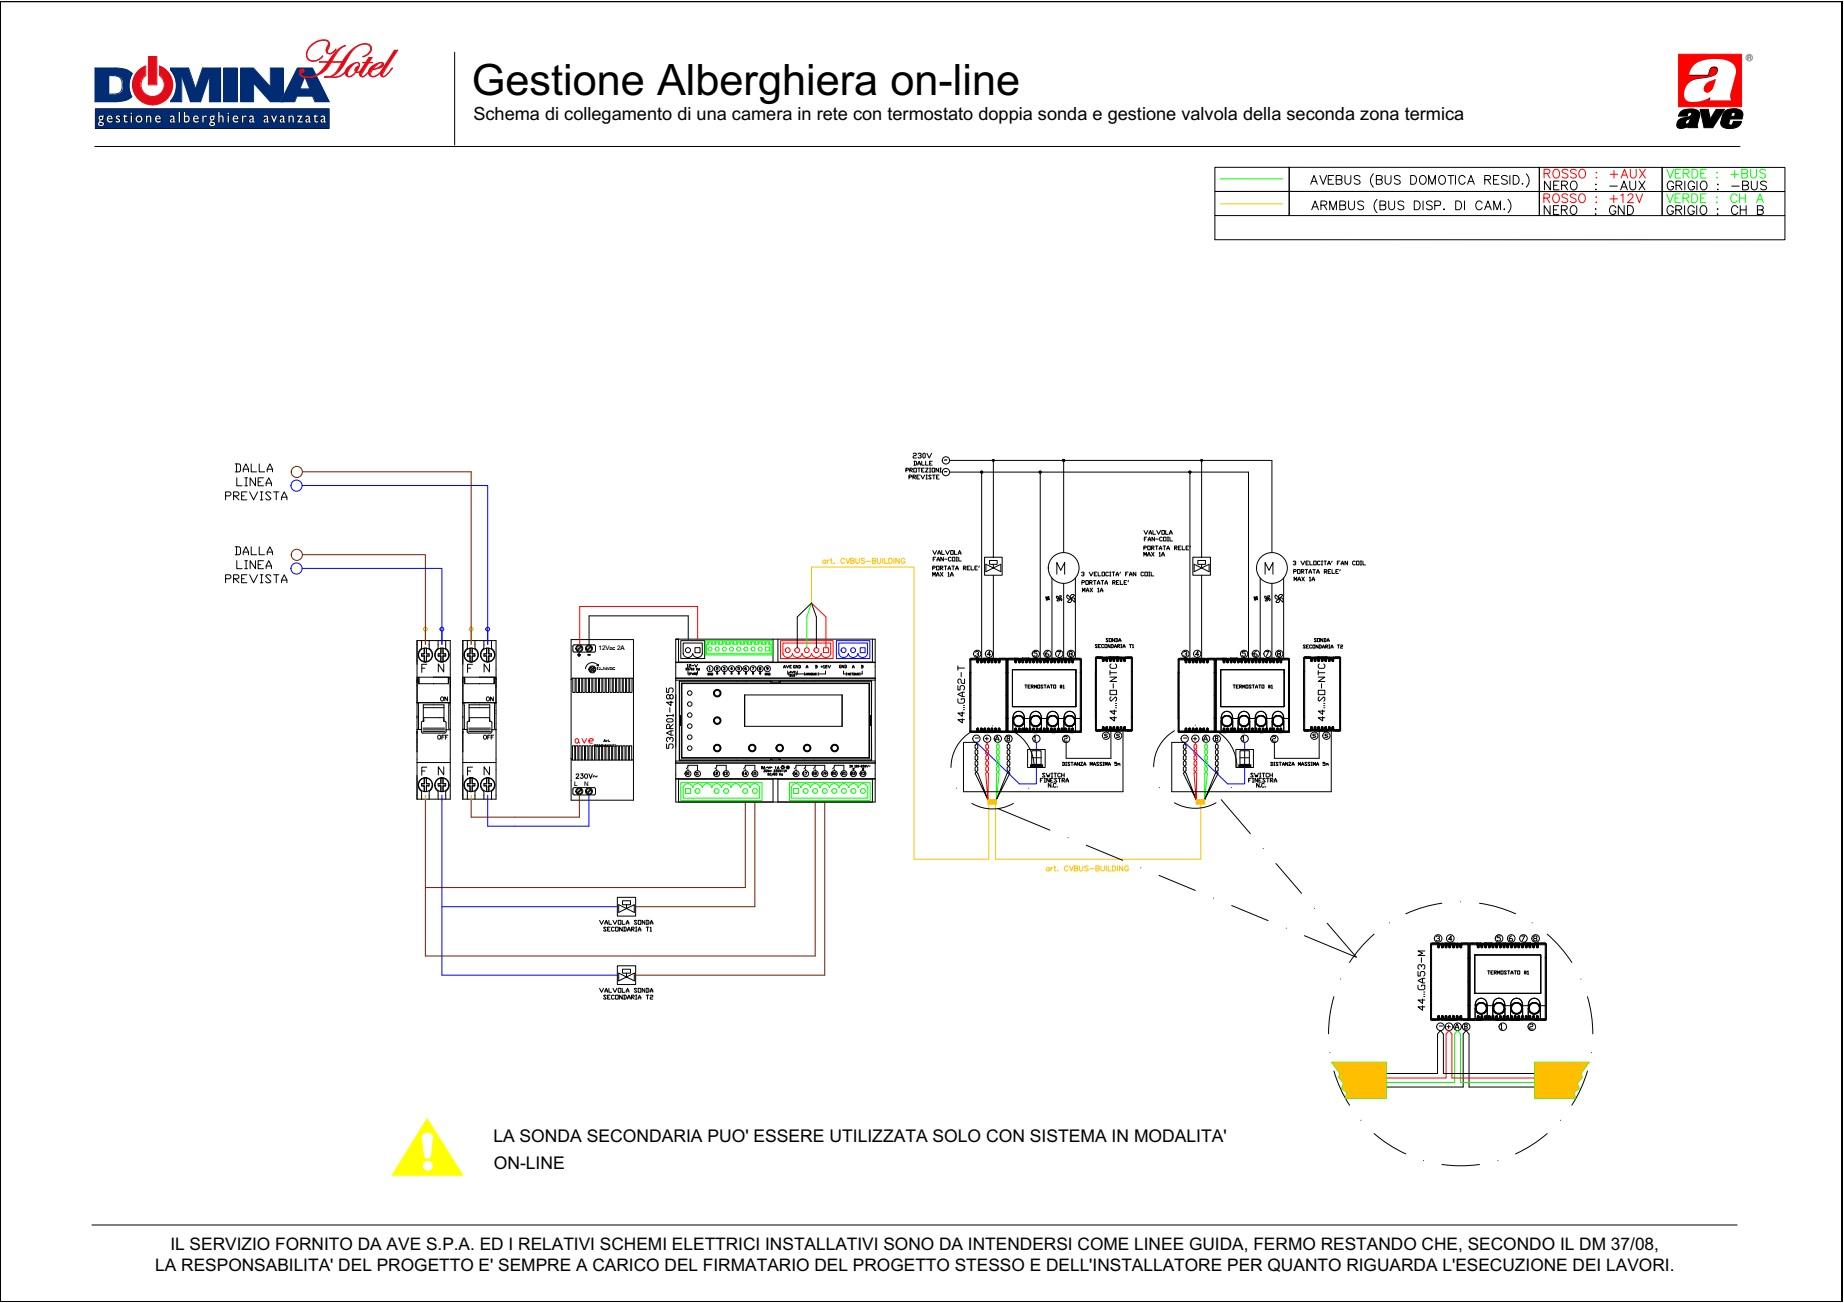 Gestione Alberghiera on-line - gestione sonda-valvola seconda zona termica